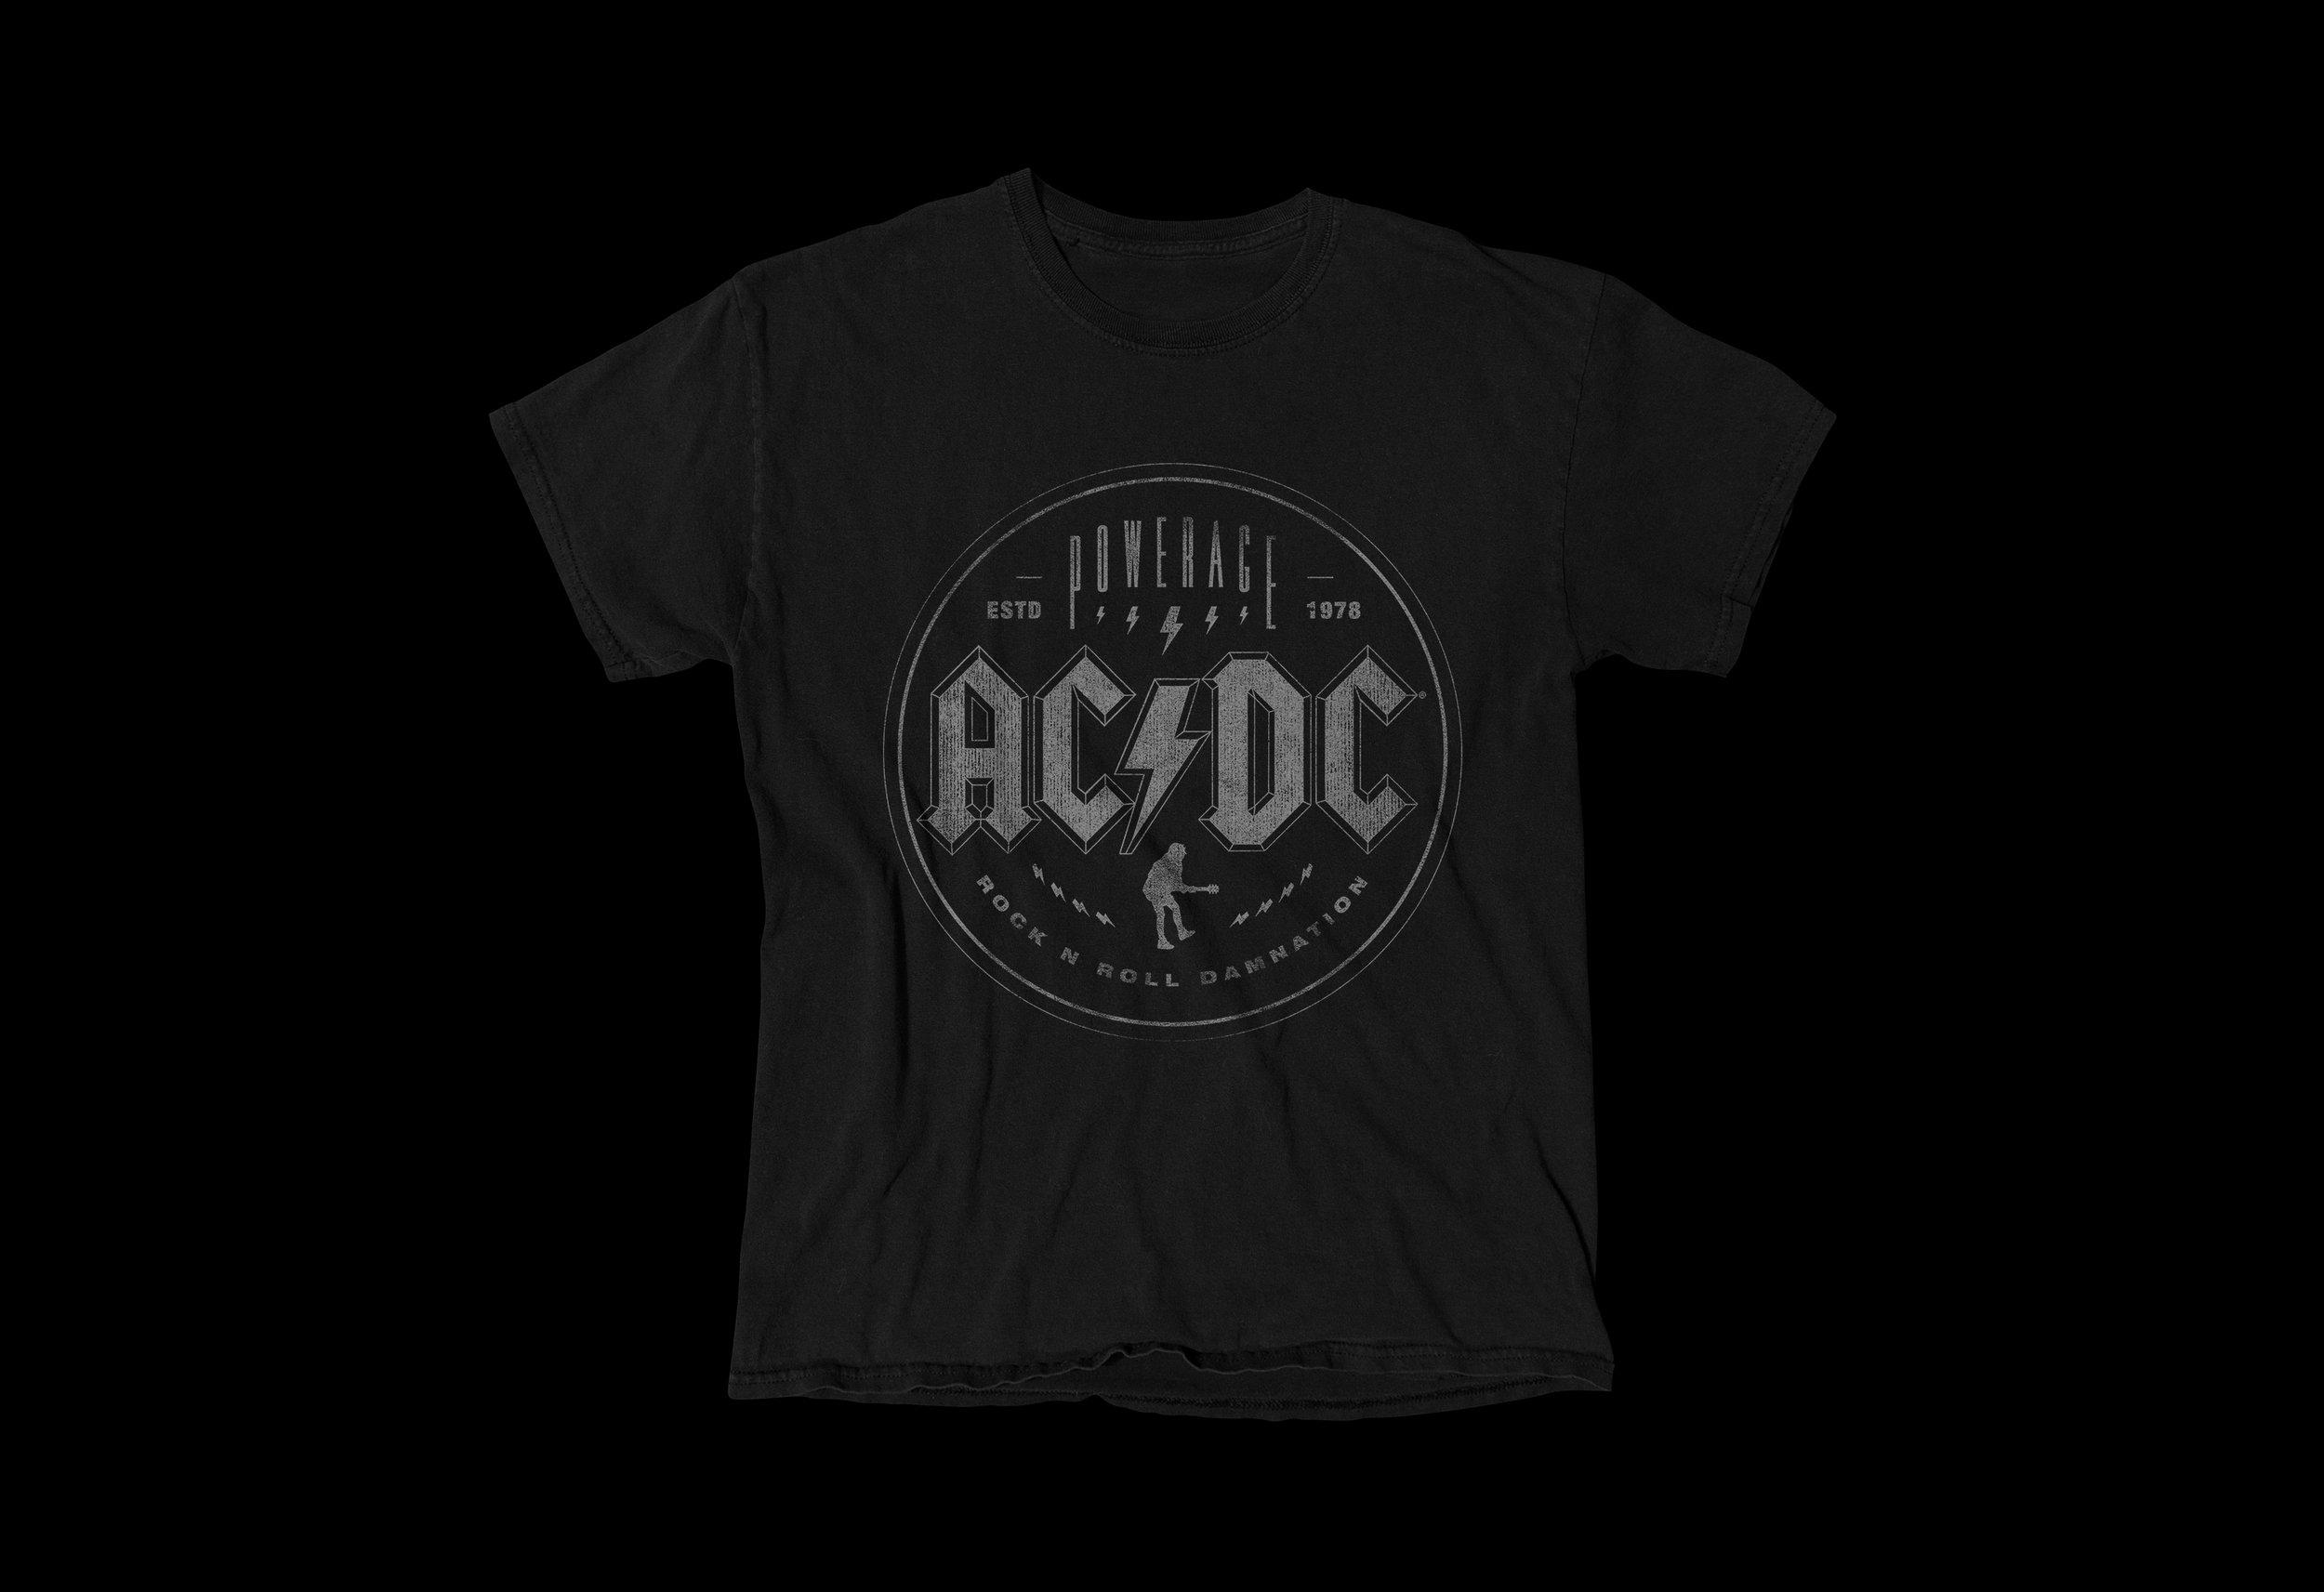 ACDC_INDUSTRIAL_1.jpg